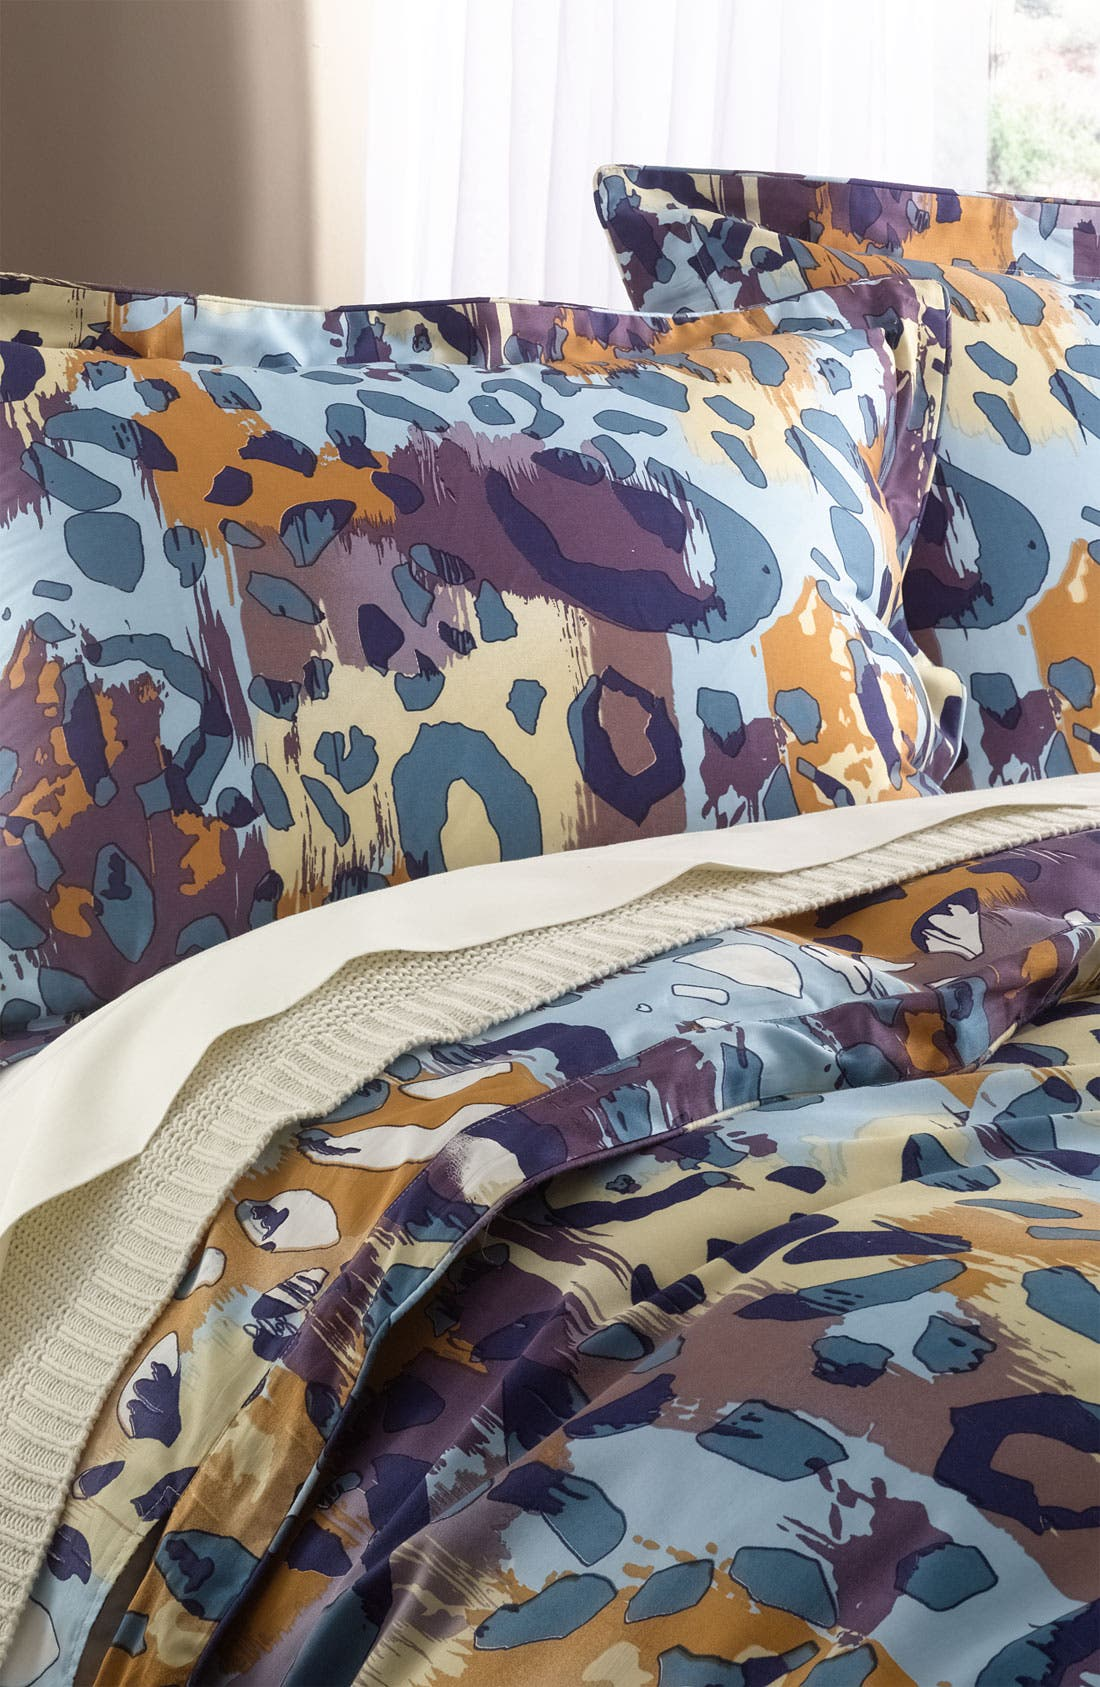 Alternate Image 1 Selected - Diane von Furstenberg 'Paper Cheetah' 300 Thread Count Pillow Sham